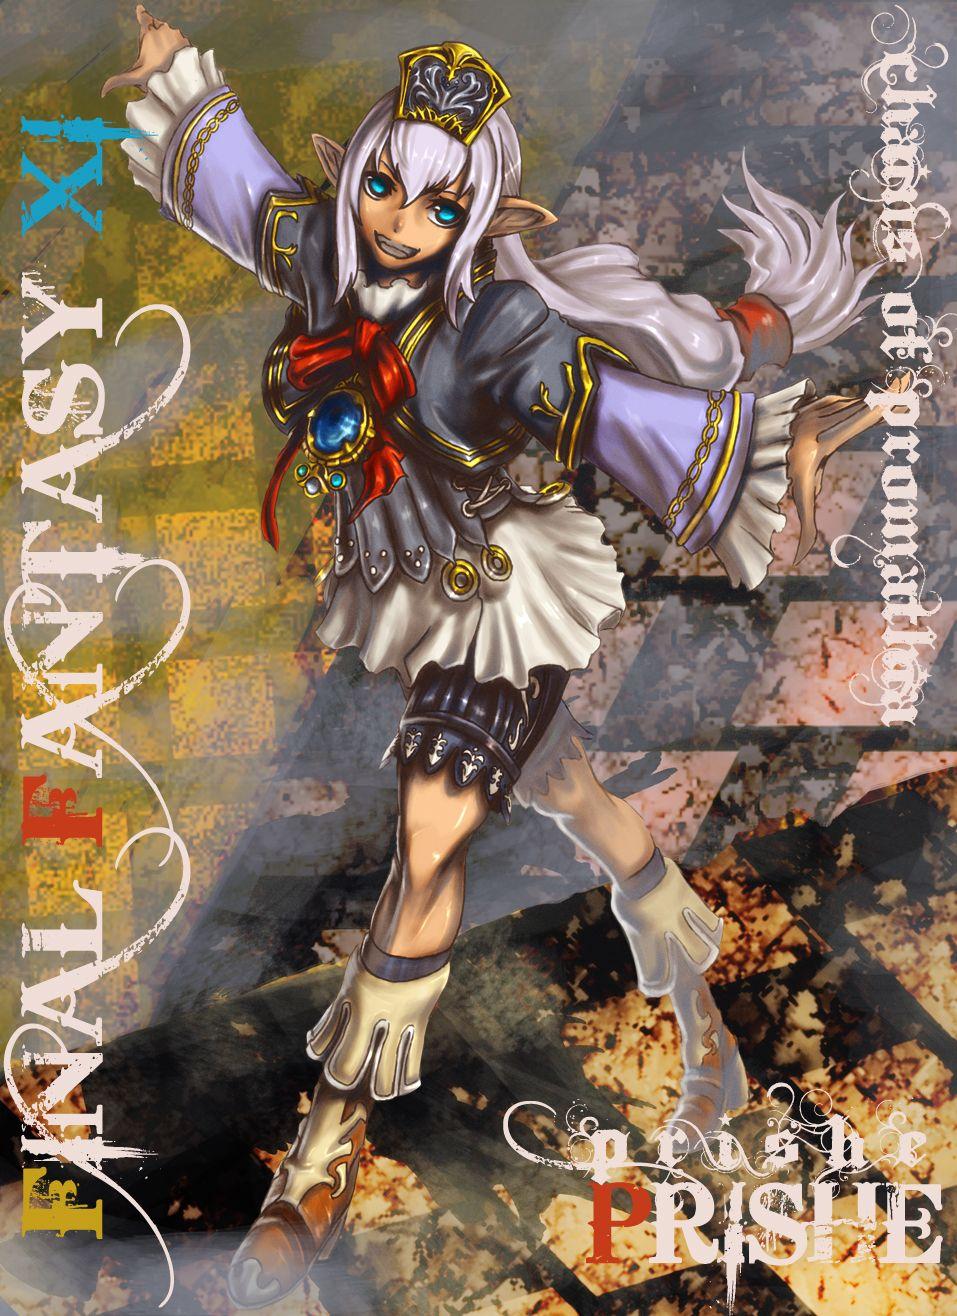 Prishe Final Fantasy XI Final fantasy xi Final fantasy Fantasy 957x1316